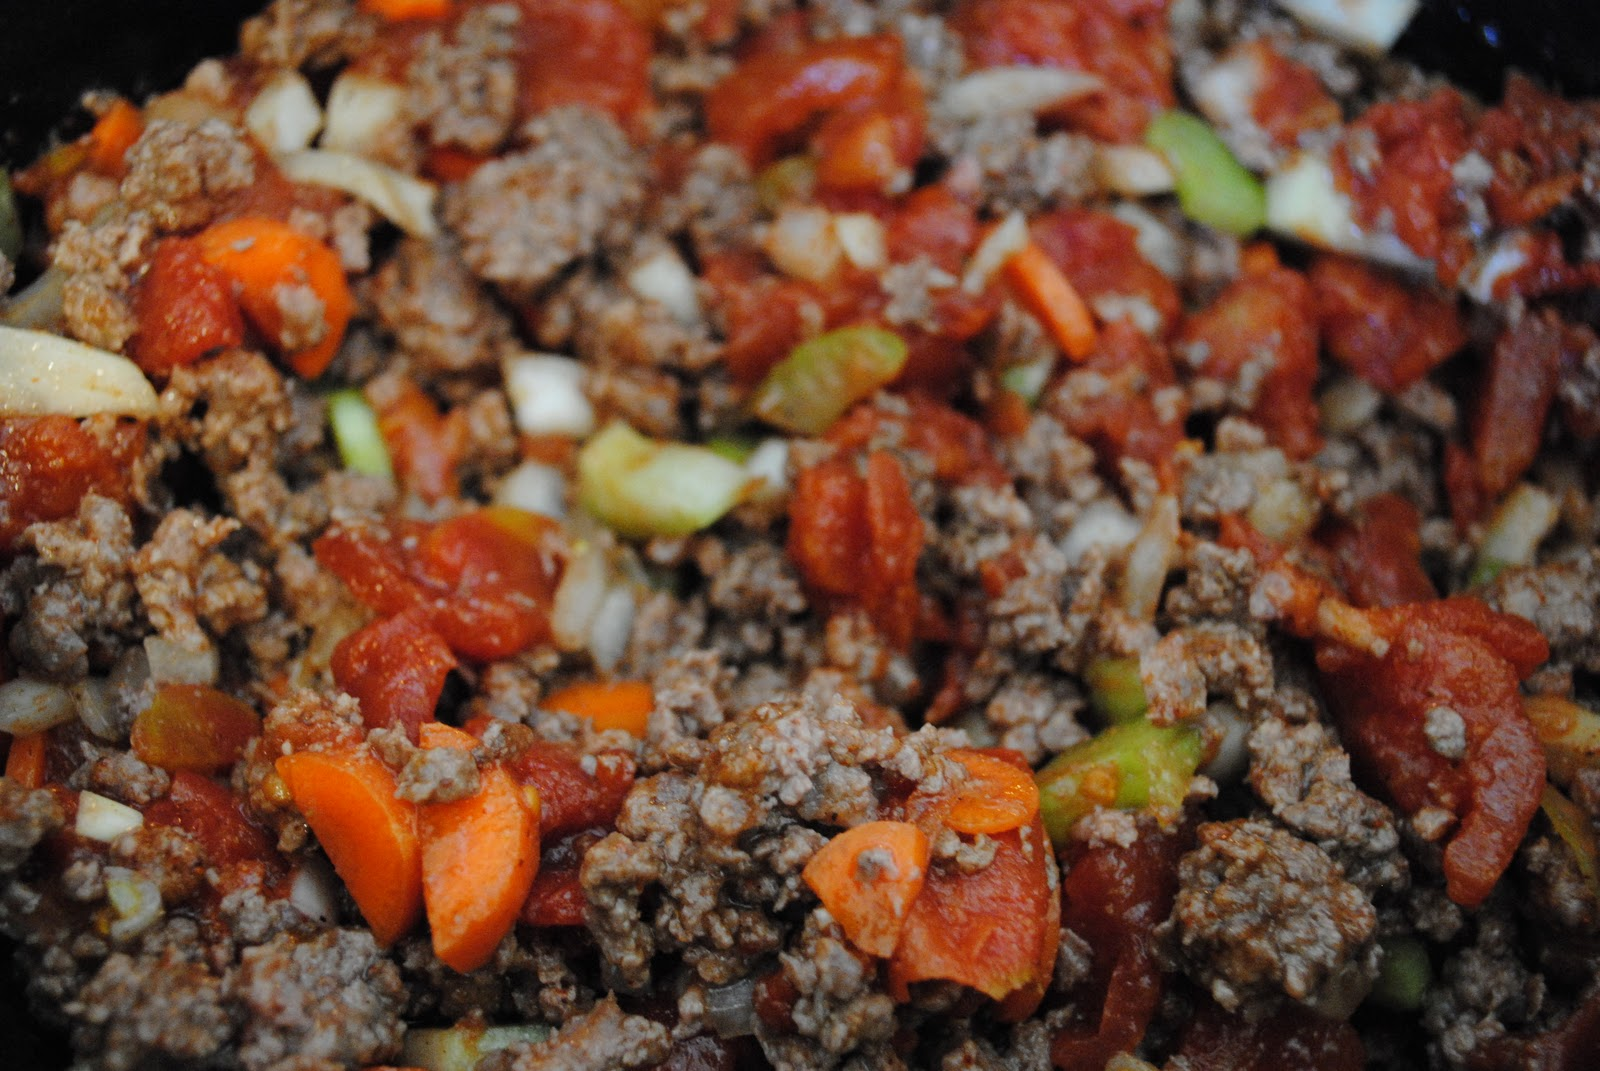 Oscarelli: Slow-cooker venison sloppy joes